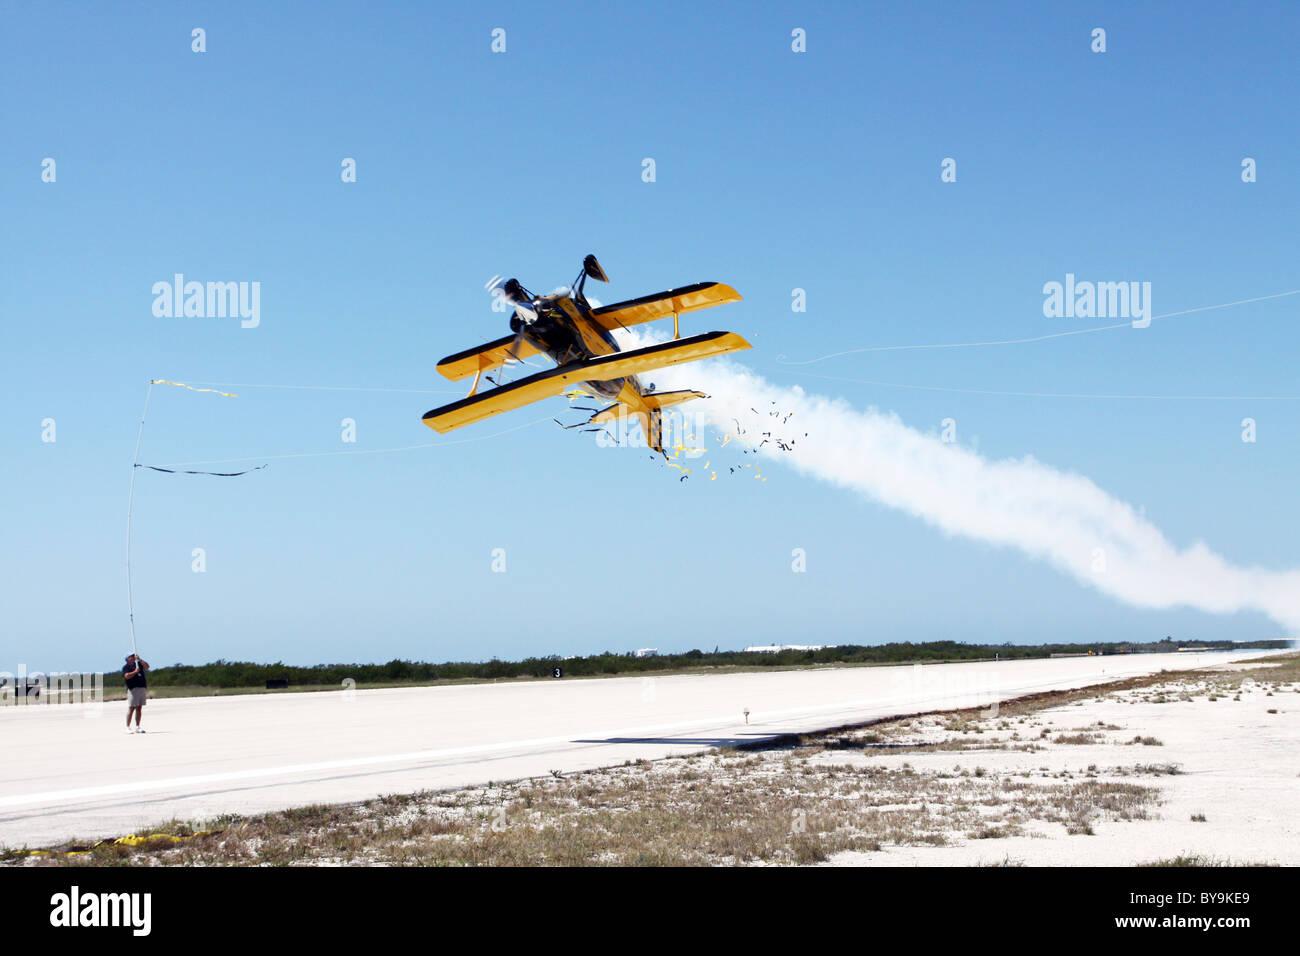 Bi=plane flying upside down. - Stock Image